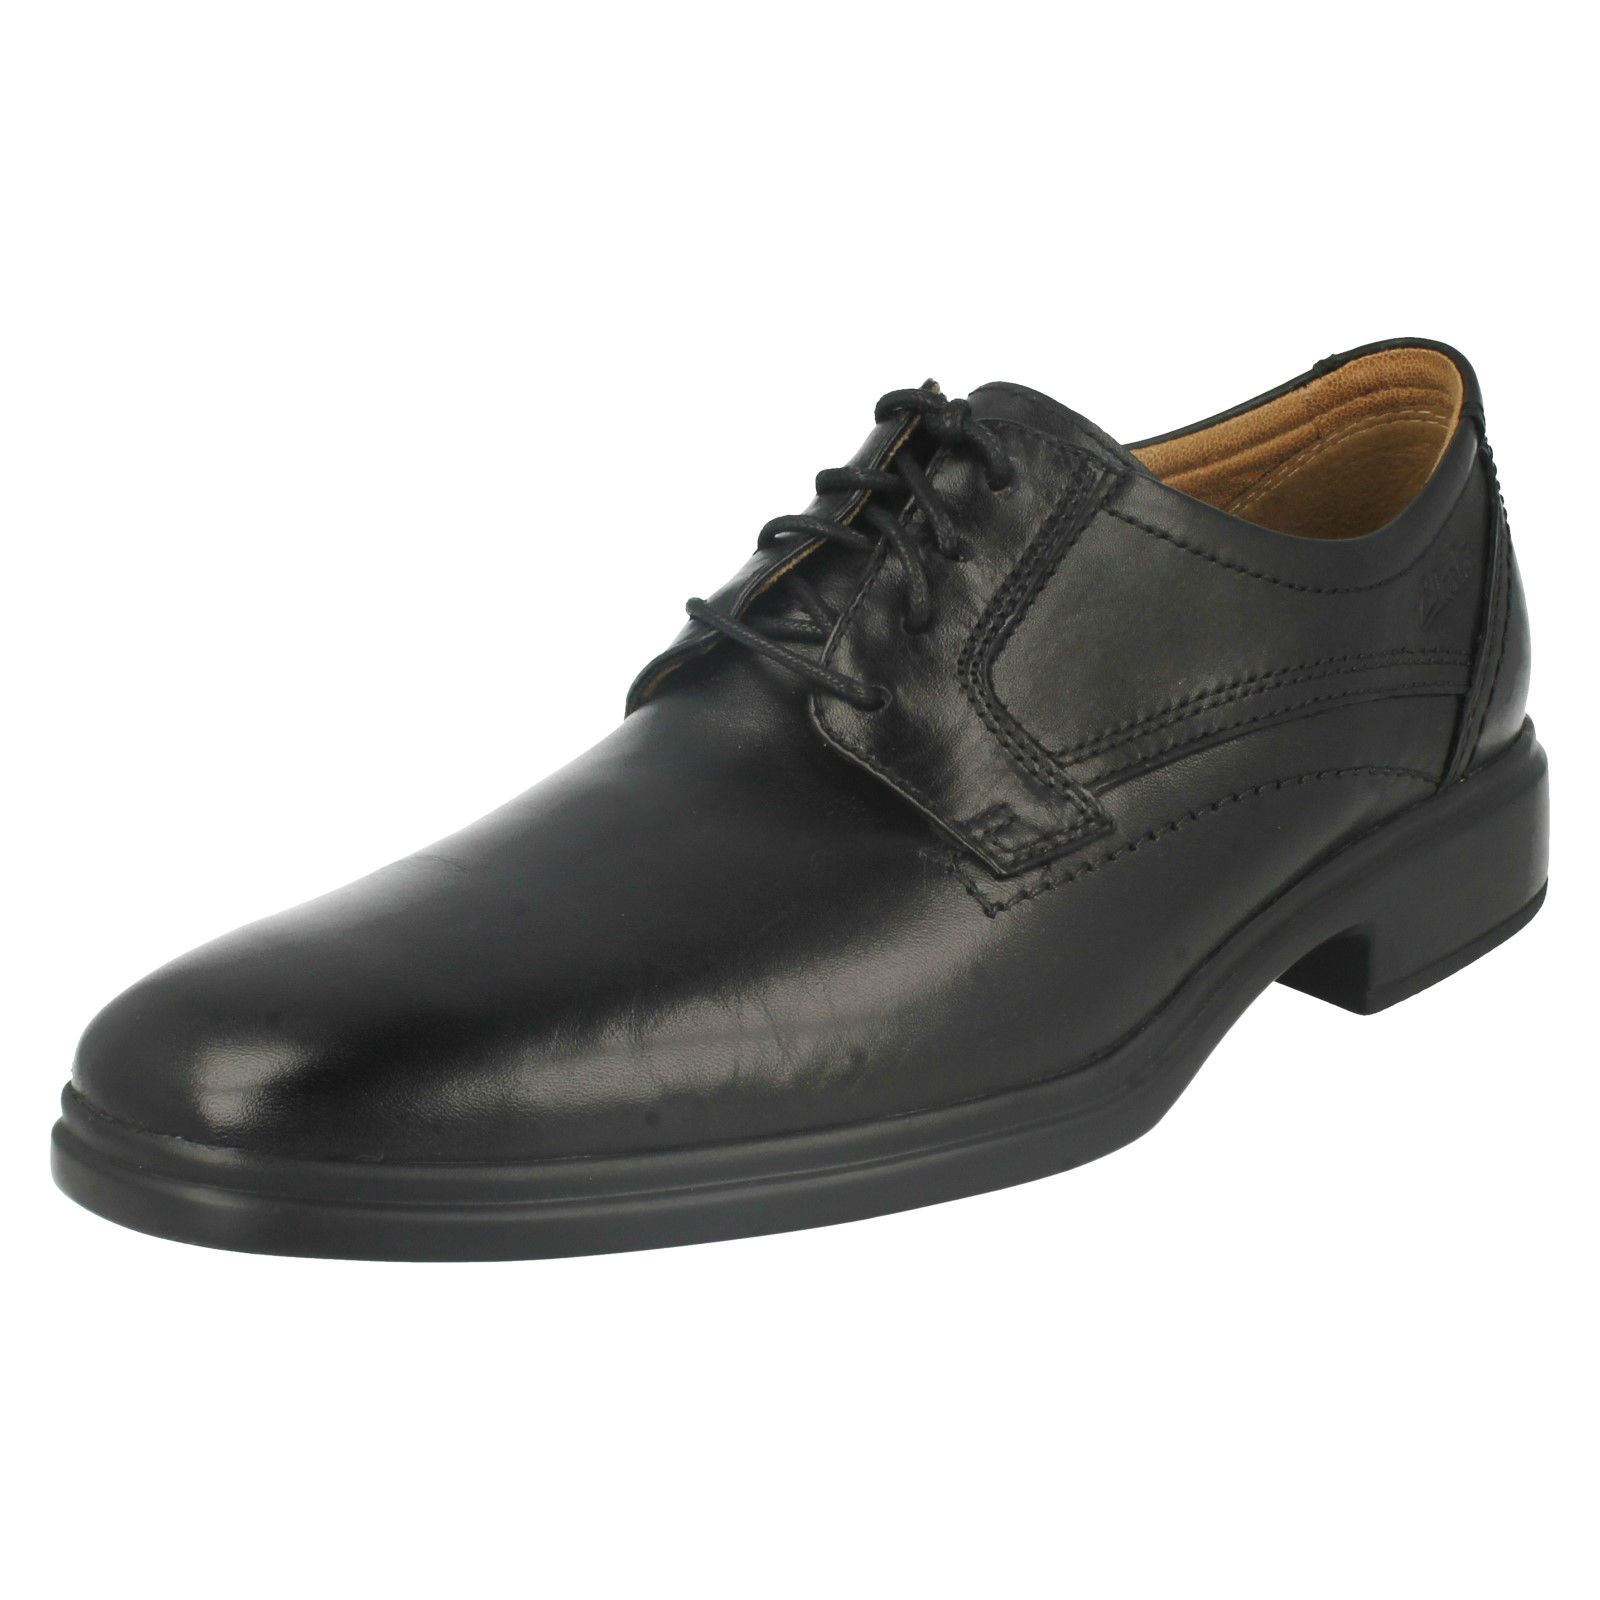 con Glevo para Clarks cordones zapatos formales hombre negro Walk IWAqwYqFZ